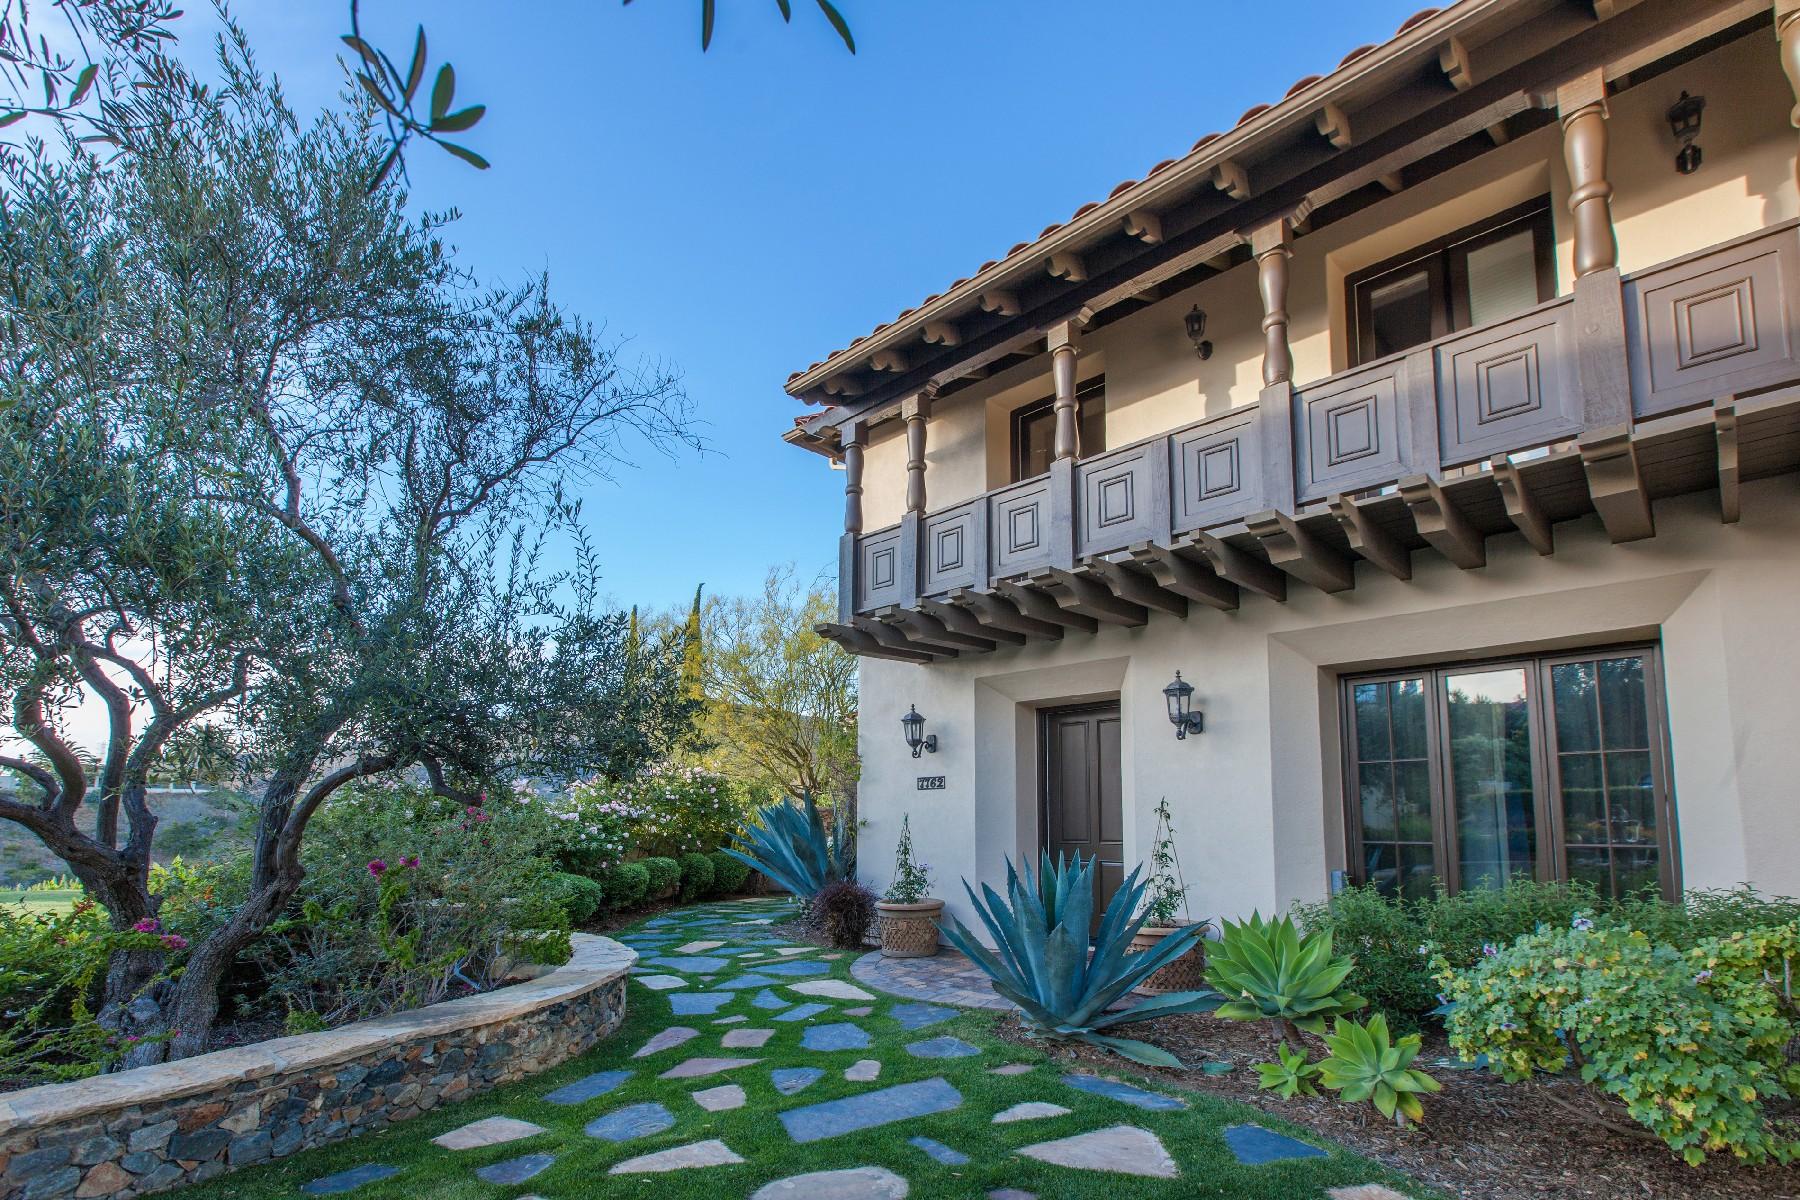 Casa Unifamiliar por un Venta en Calle Amanecer 7762 Calle Amanacer Rancho Santa Fe, California 92067 Estados Unidos